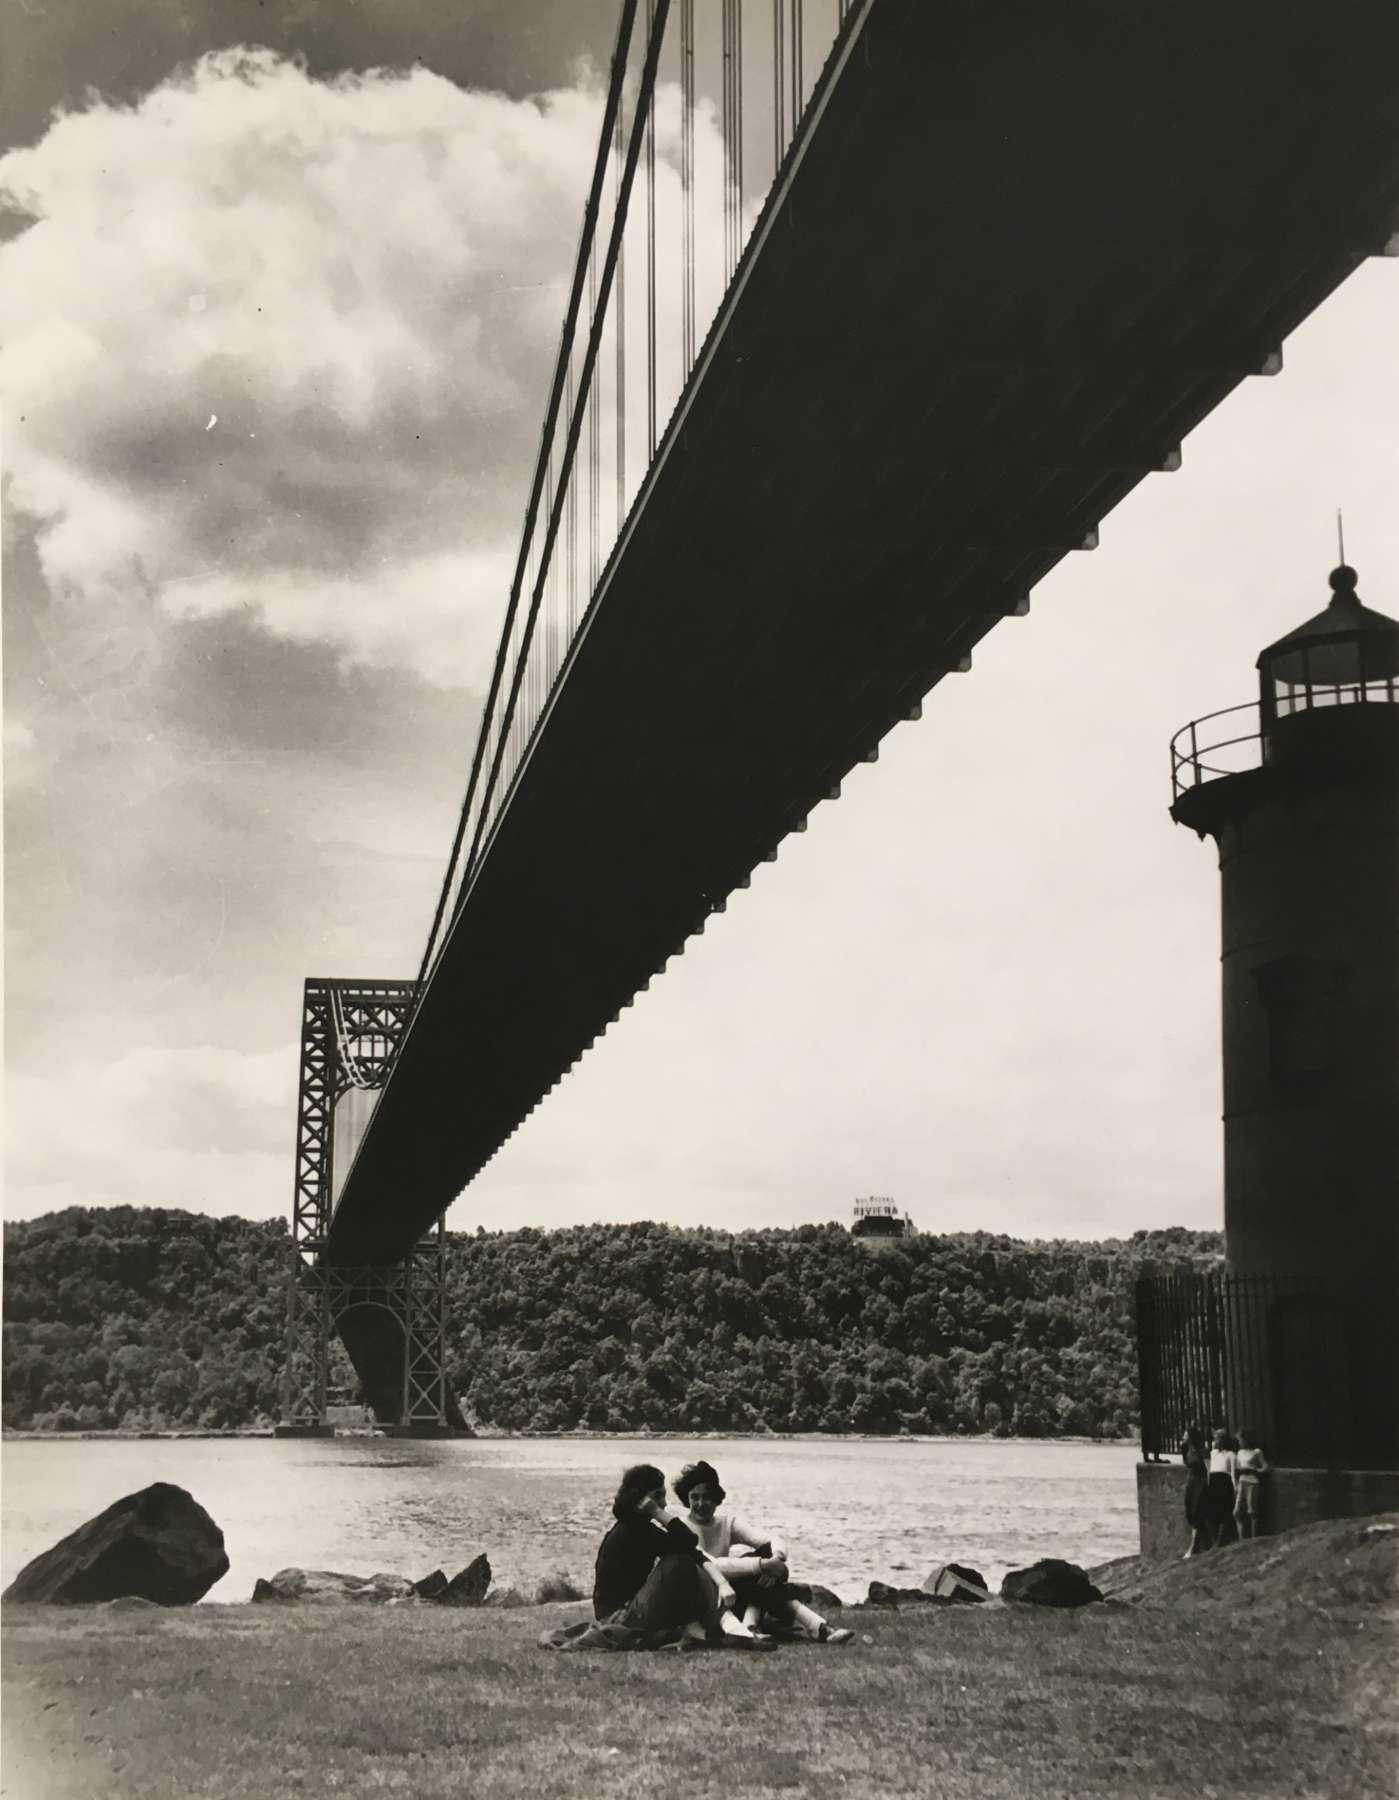 Nat Fein, George Washington Bridge, 1943 - Artwork 35714 | Jackson Fine Art